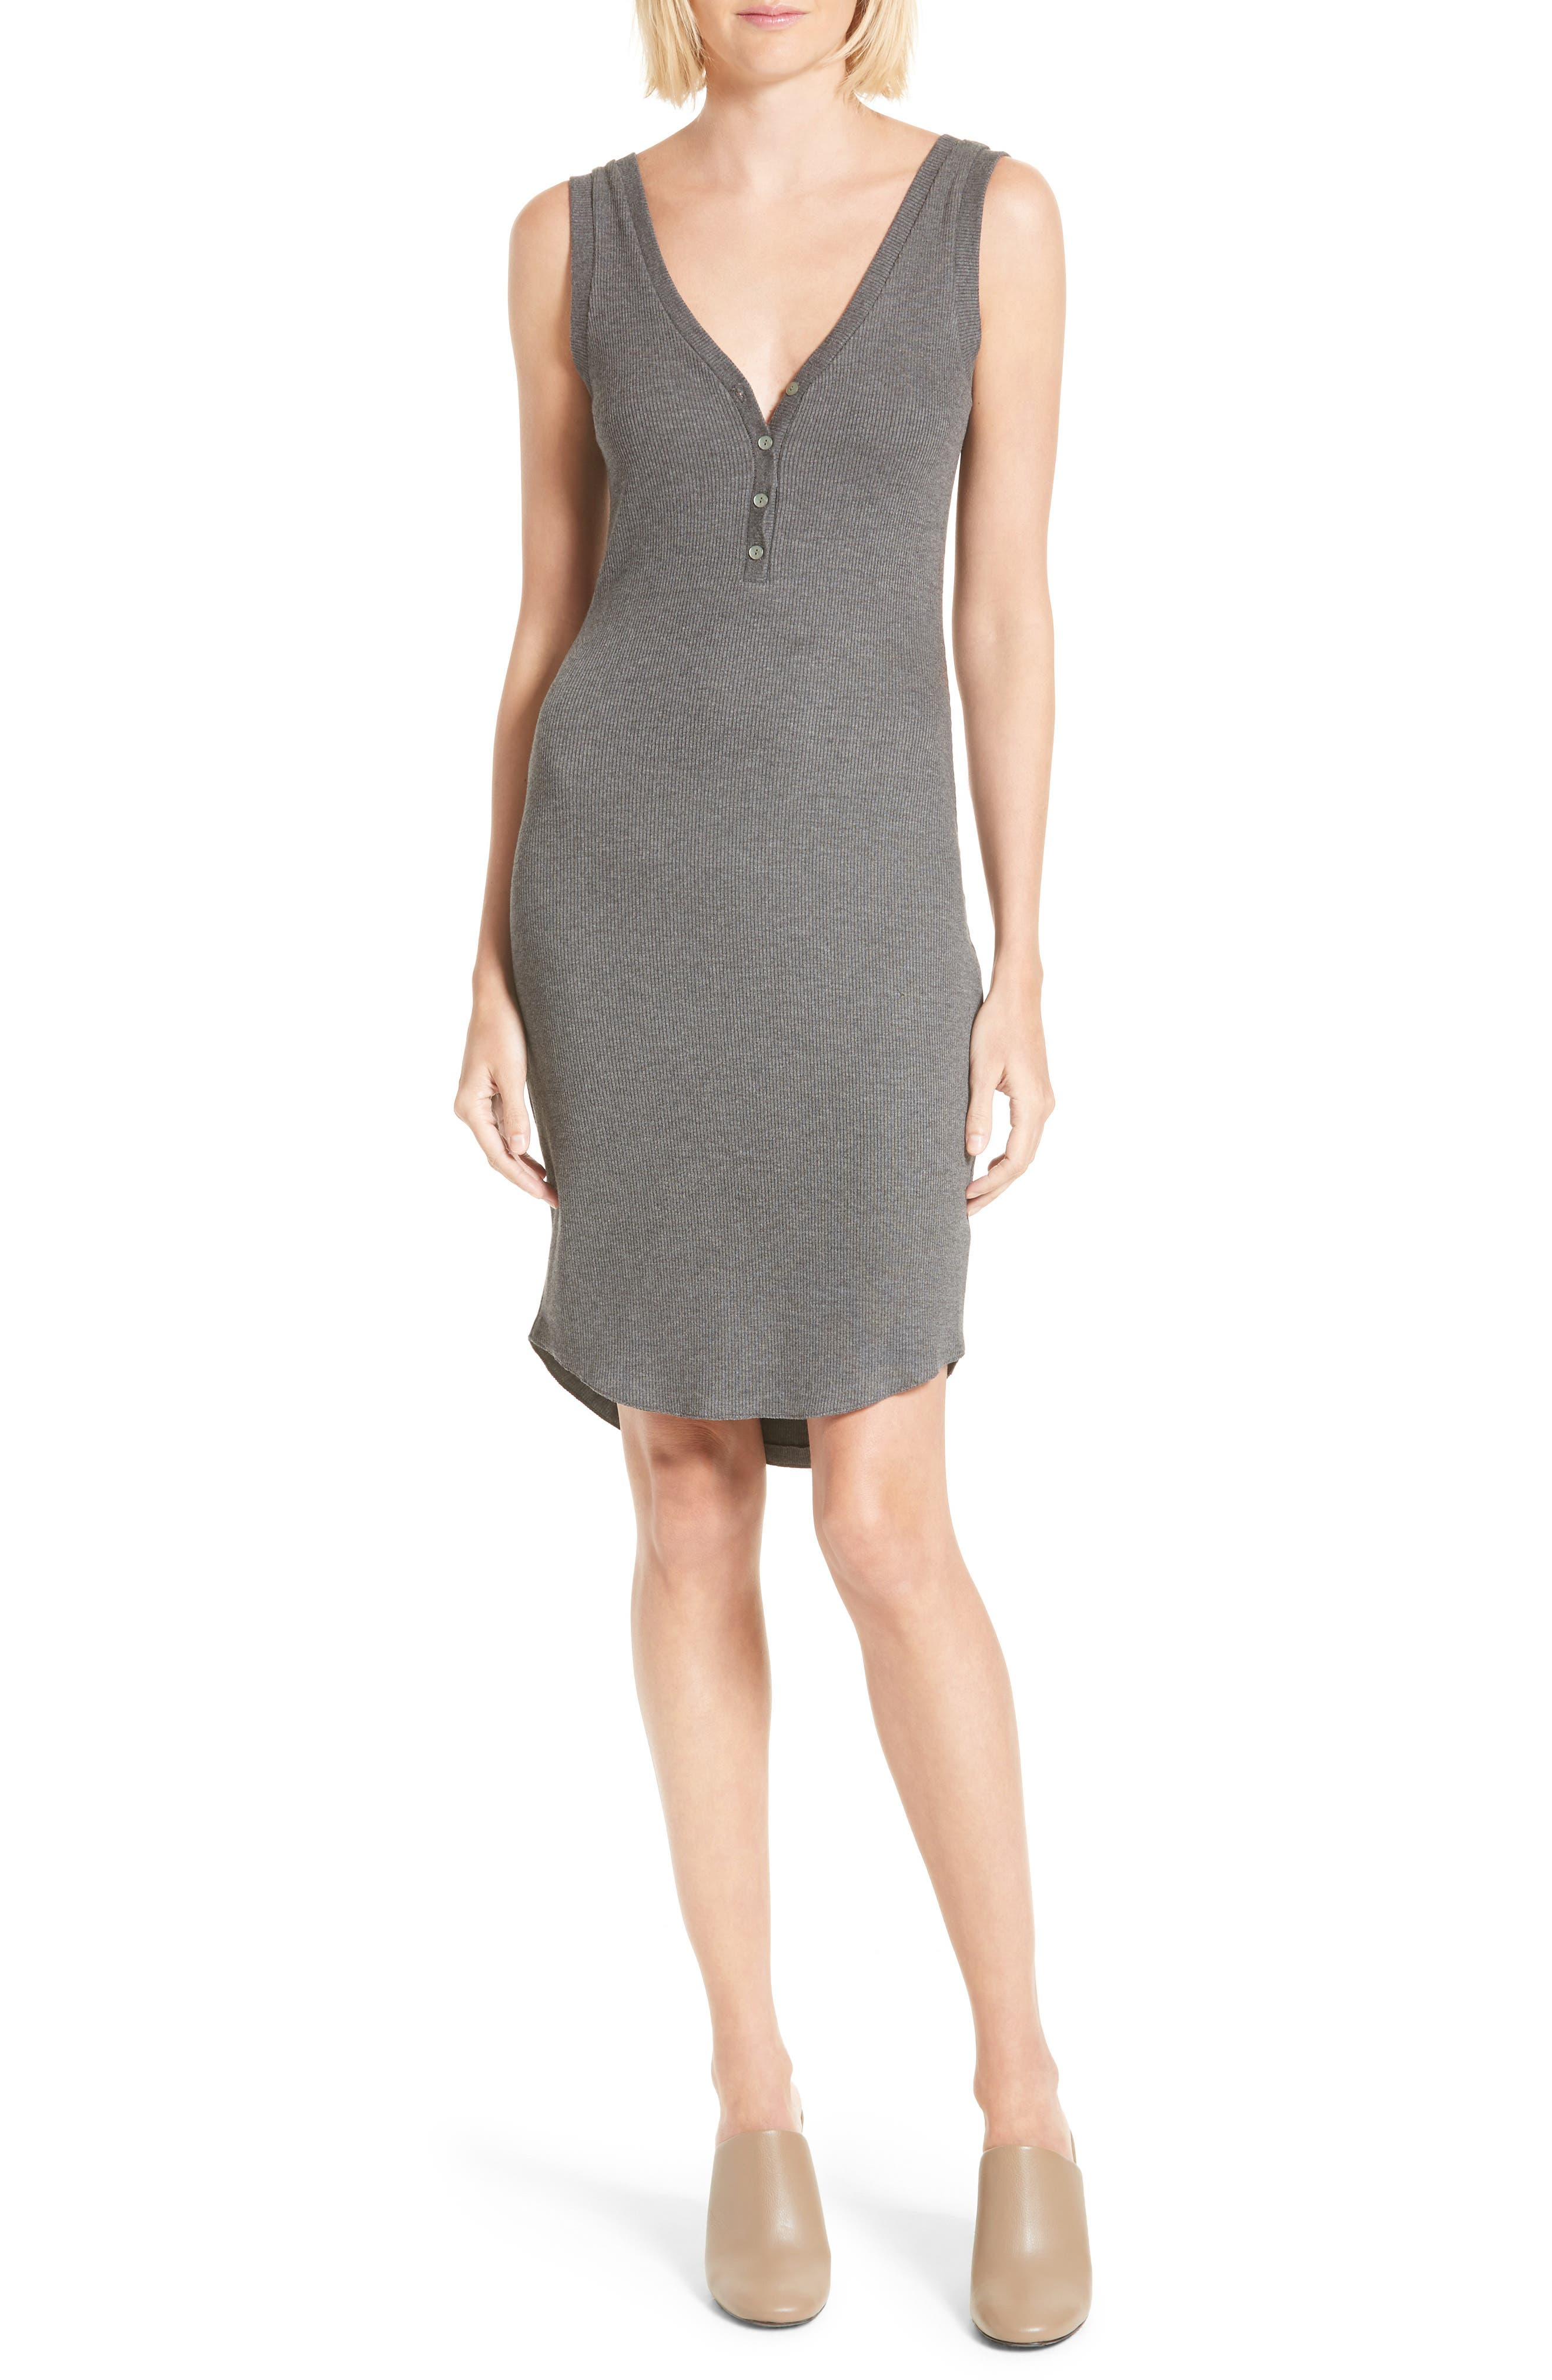 Main Image - L'AGENCE Everly Henley Tank Dress